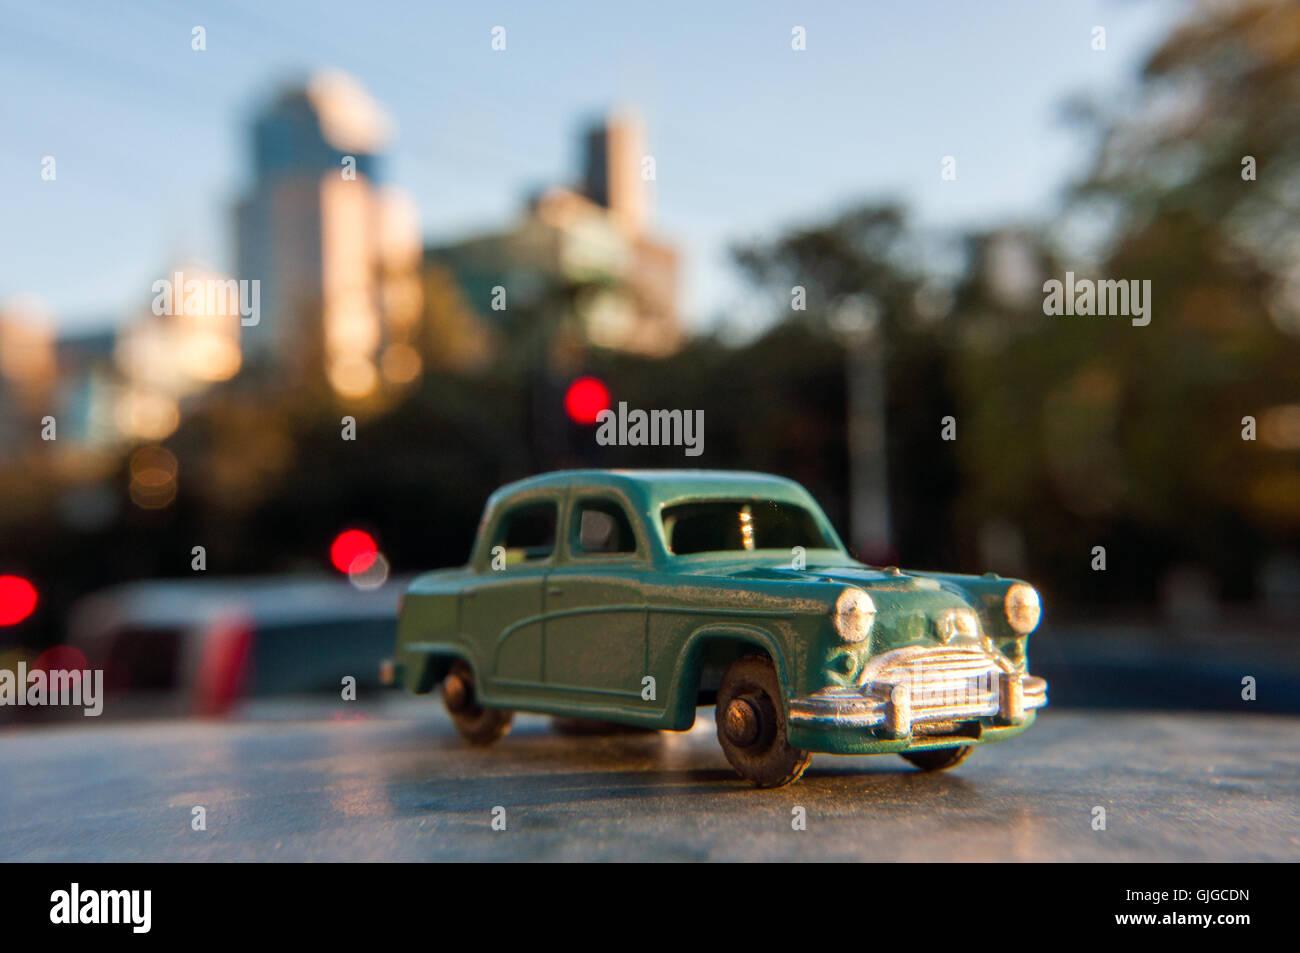 Austin A40 Stock Photos & Austin A40 Stock Images - Alamy